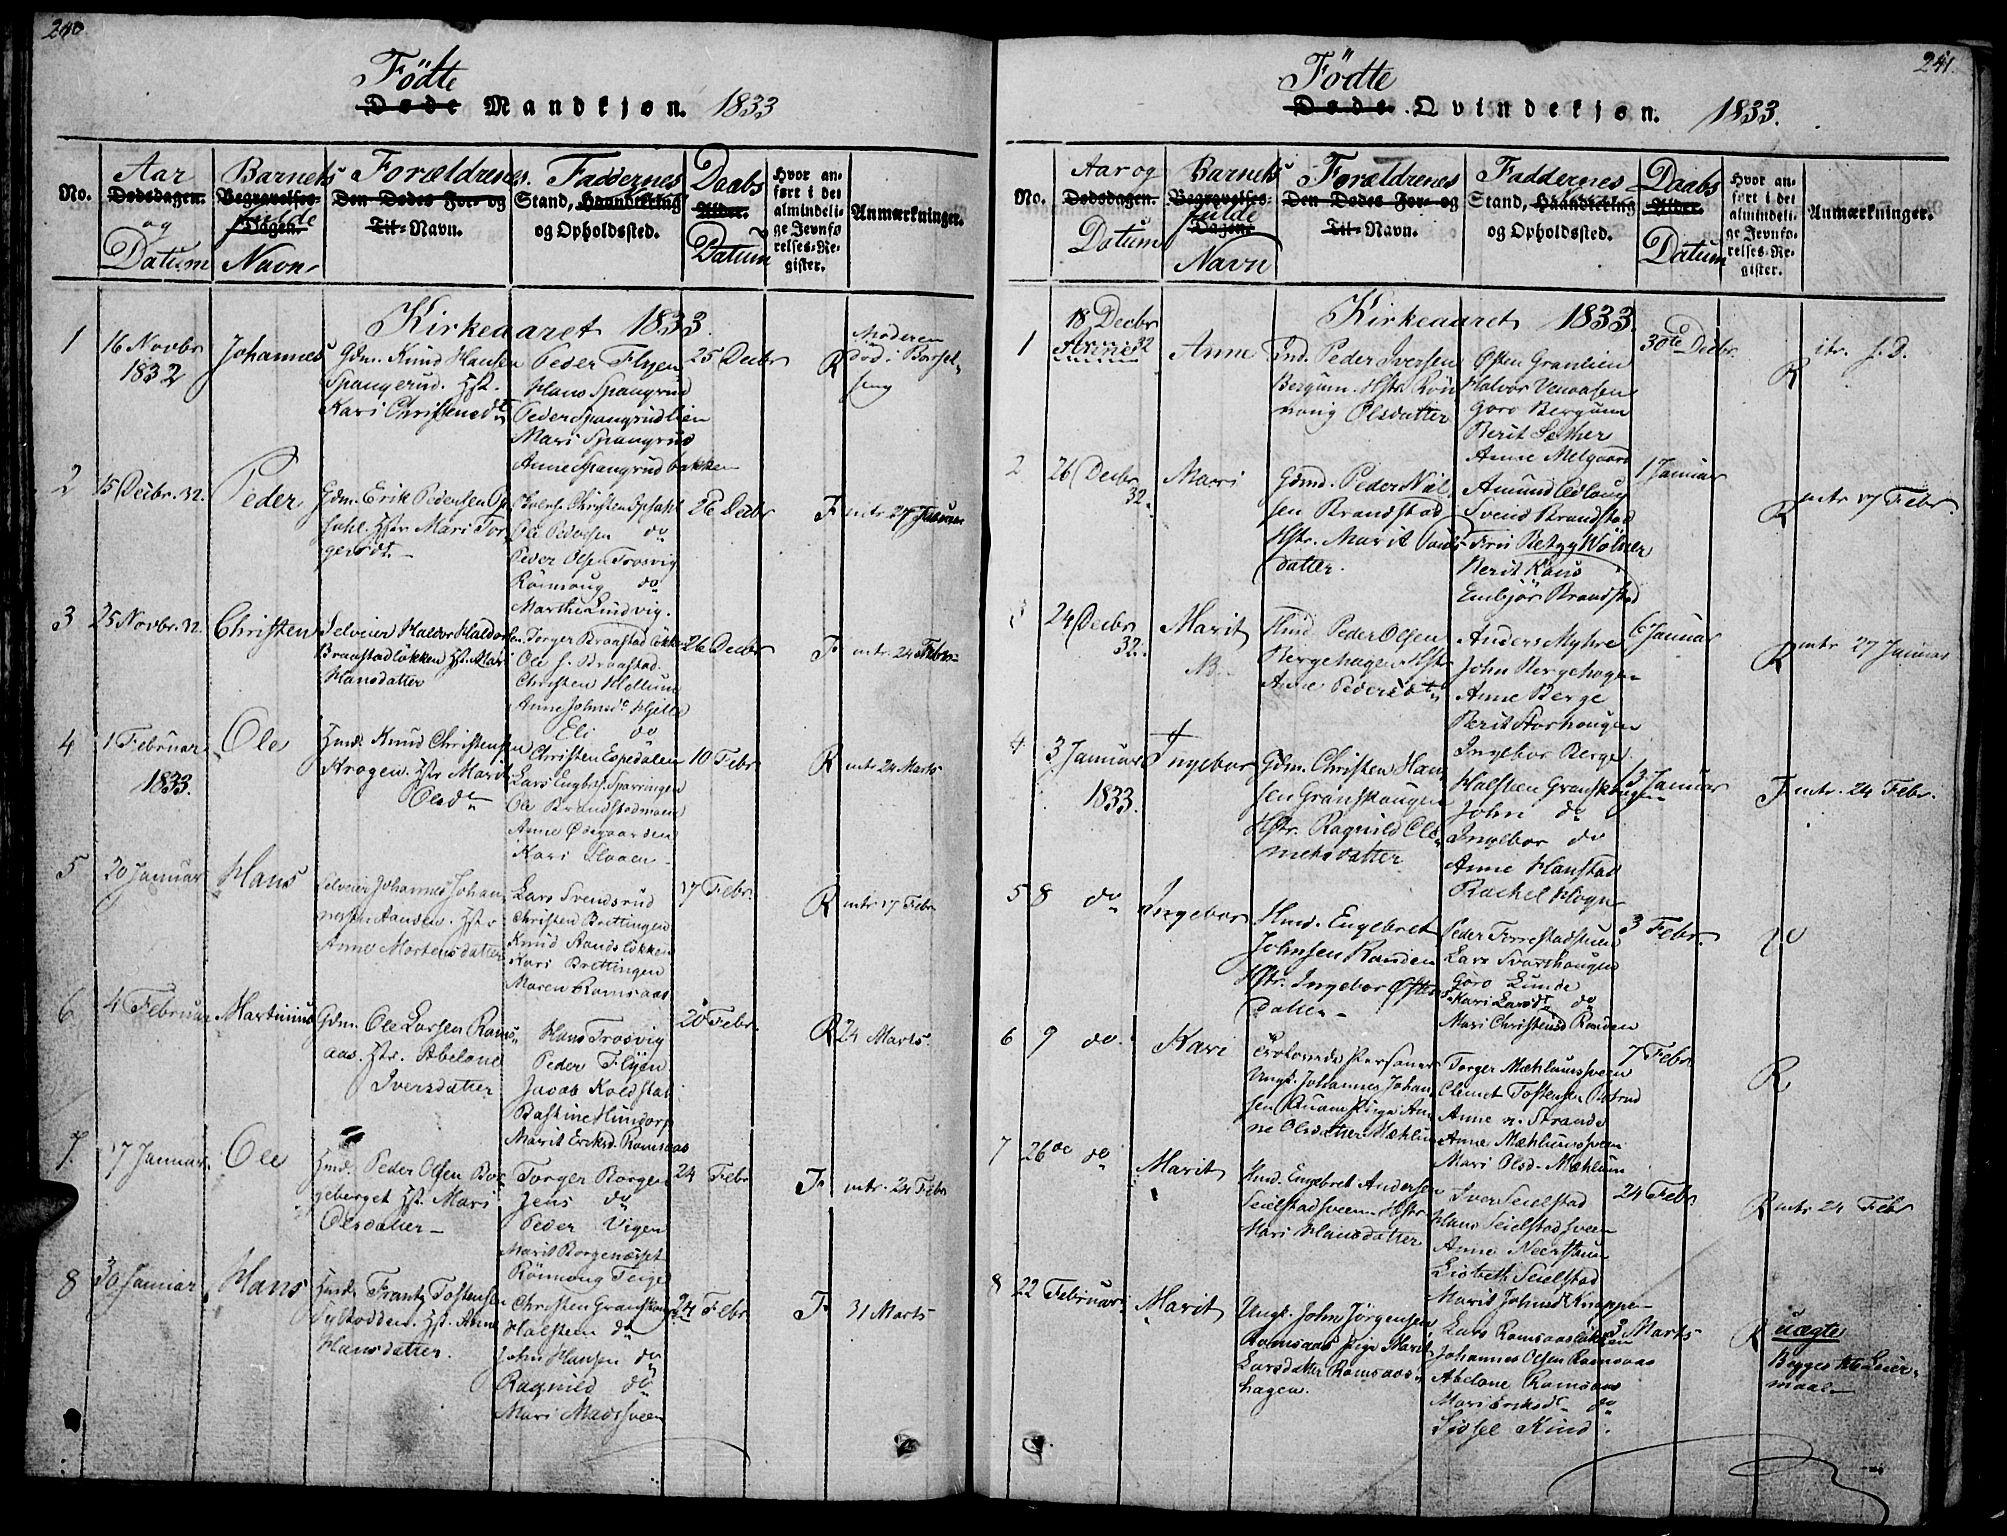 SAH, Ringebu prestekontor, Ministerialbok nr. 4, 1821-1839, s. 240-241